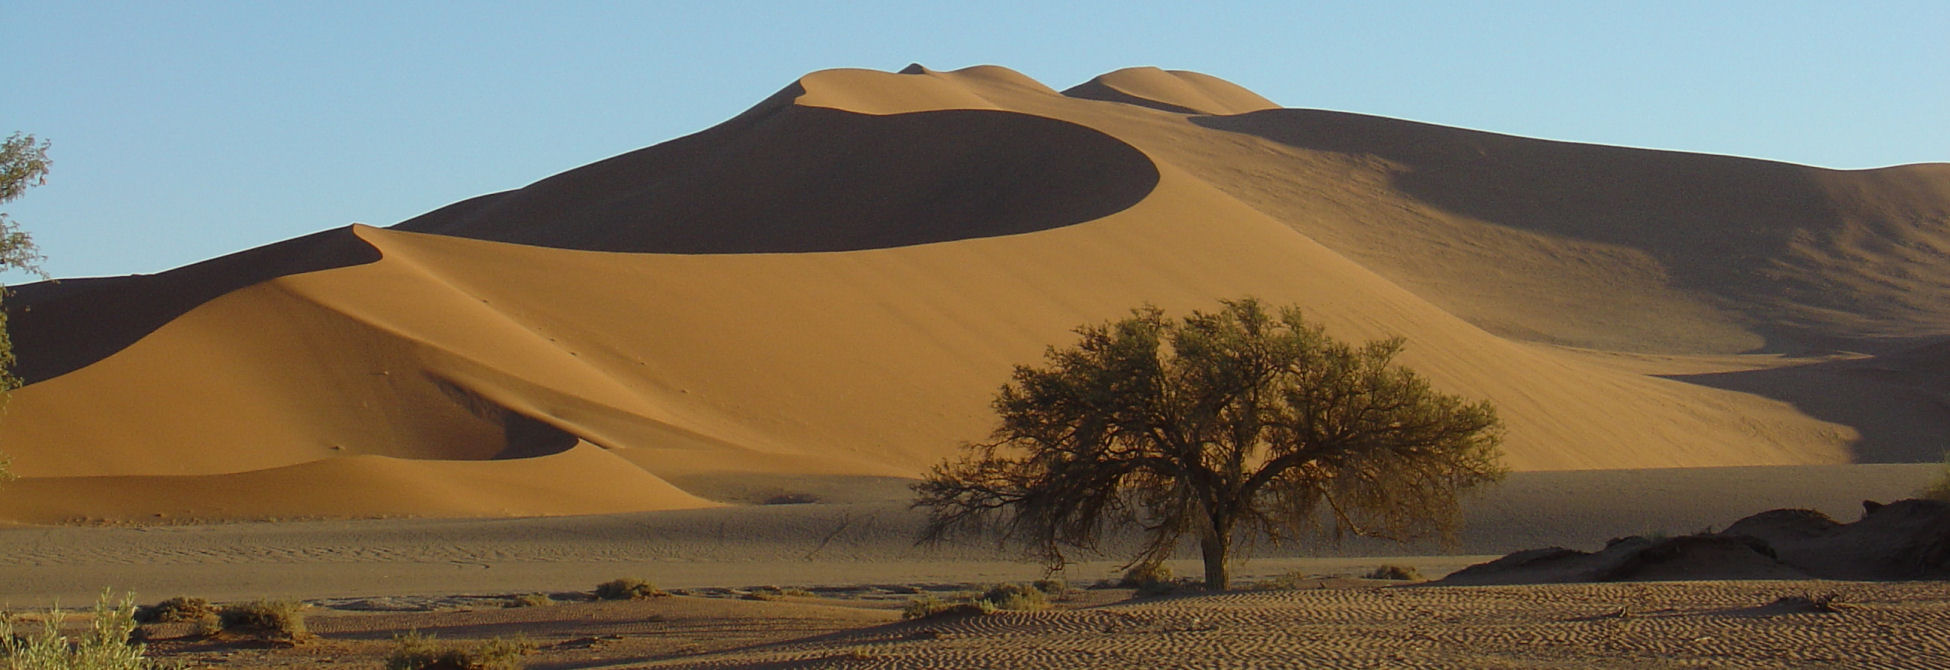 12 DAYS SELF-DRIVE NAMIBIA